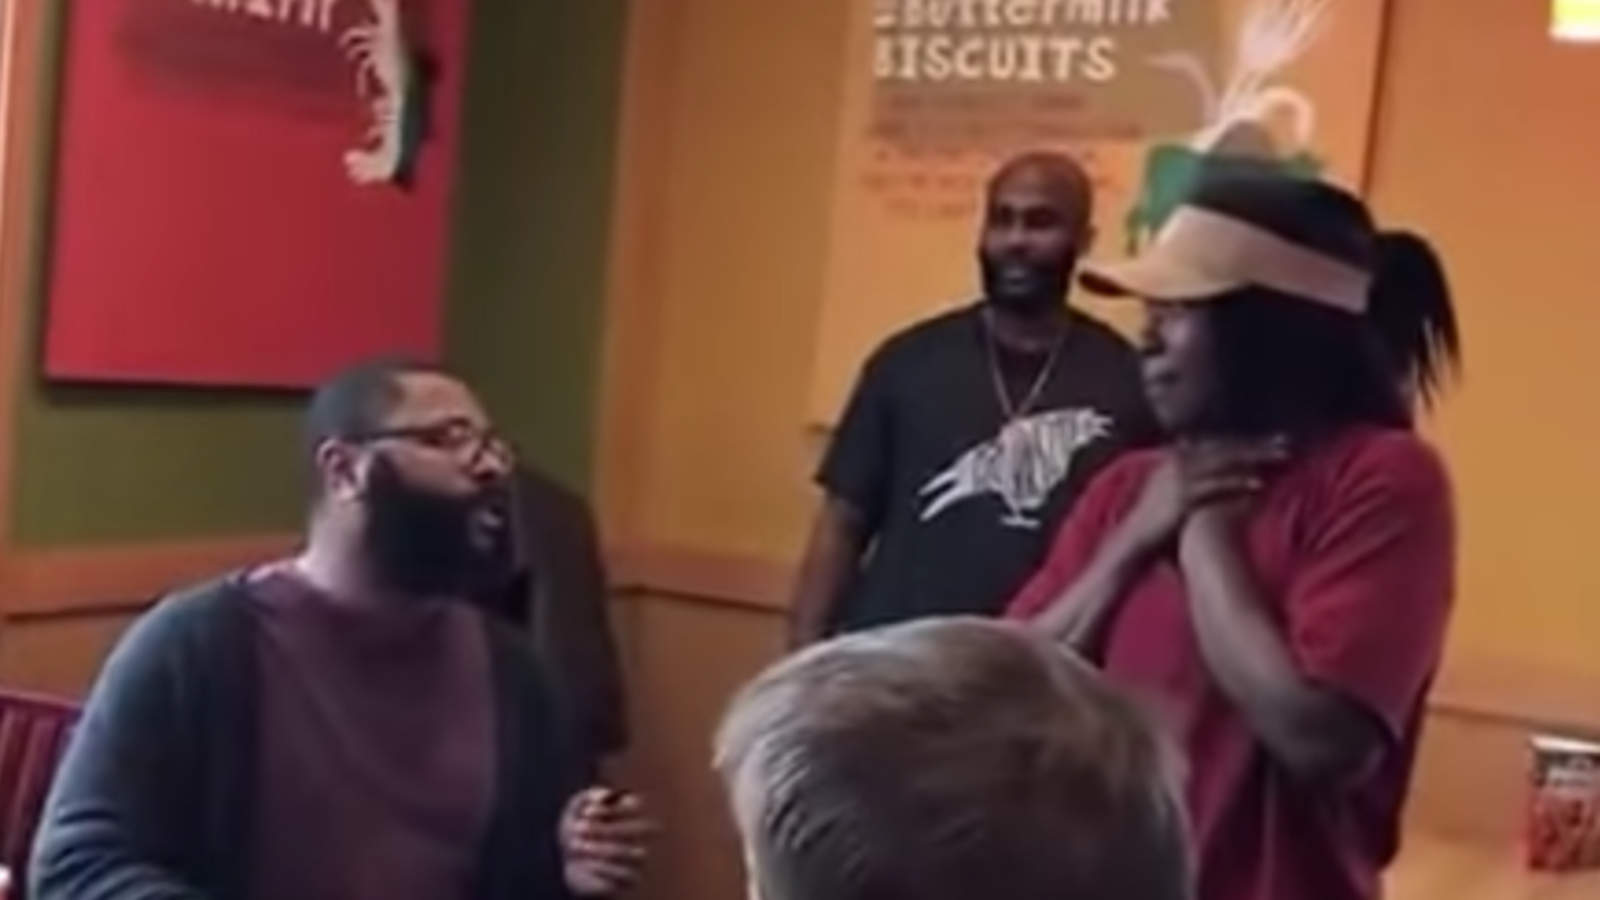 Kansas City Mo Man Sets Up Gofundme To Surprise Popeyes Employee